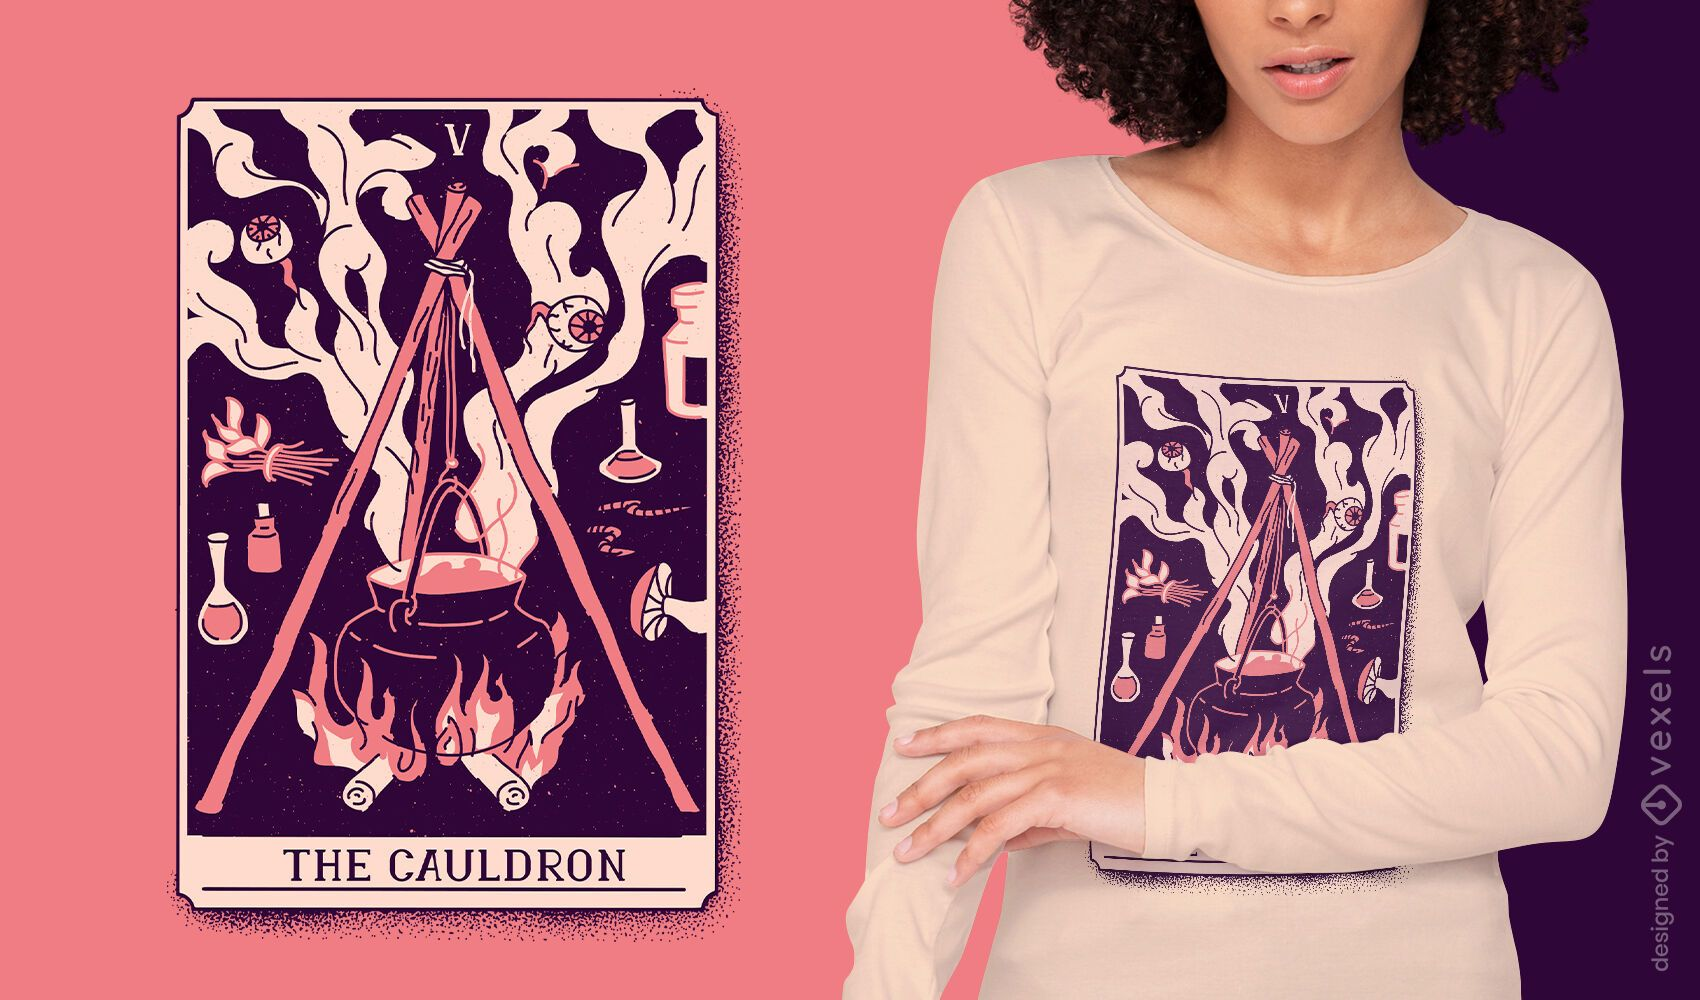 Diseño de camiseta de carta de tarot mística de caldero